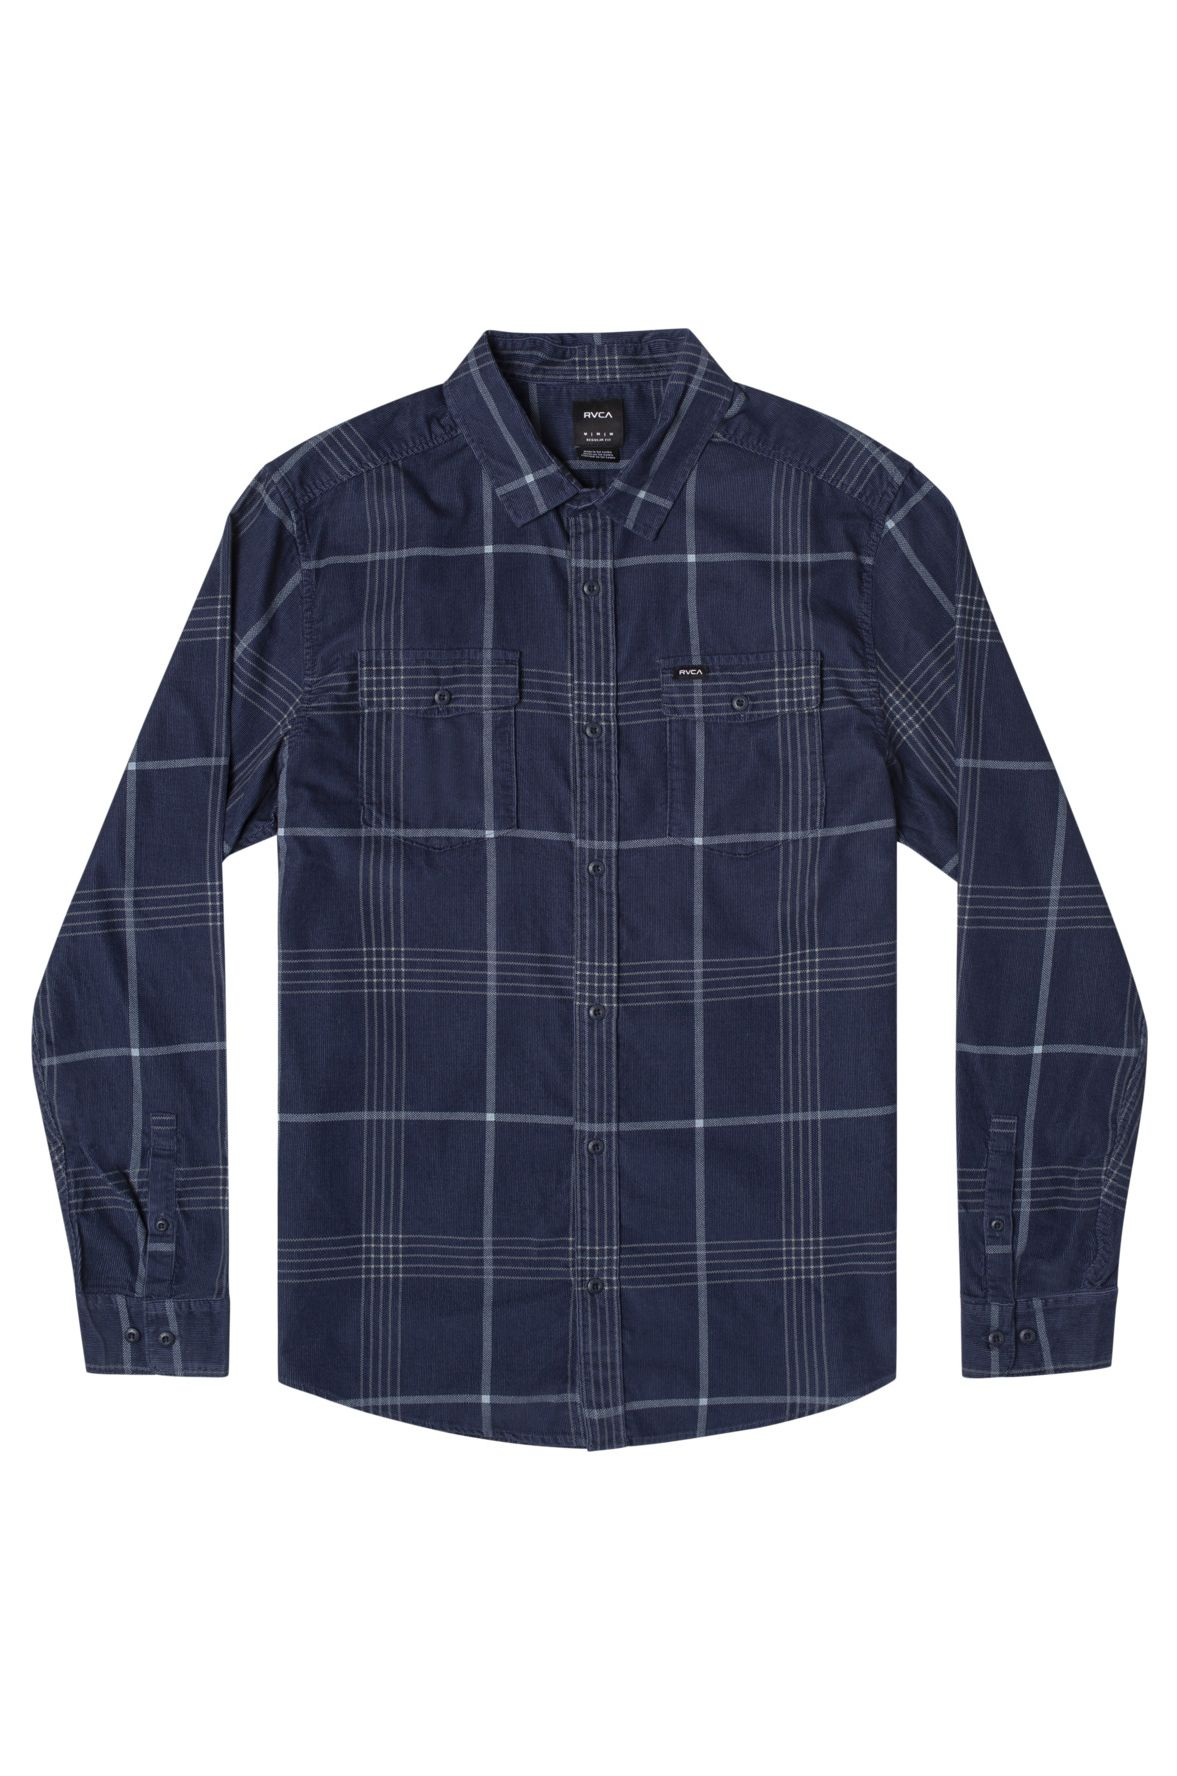 RVCA Shirt BLUES WALK CORD LS Moody Blue